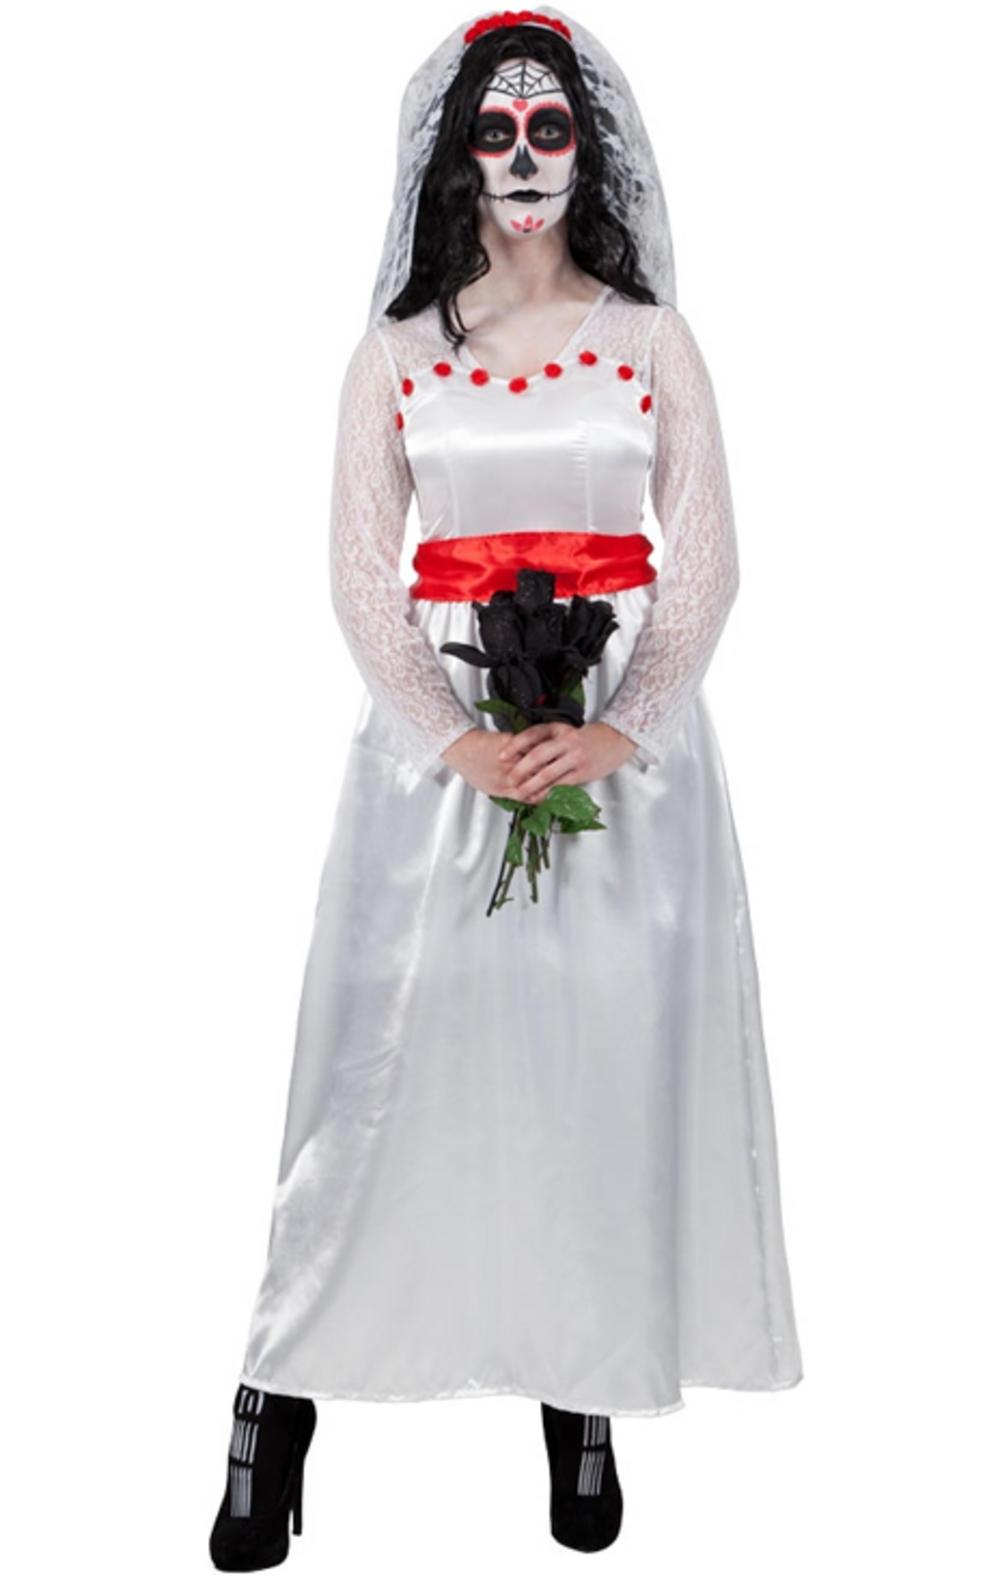 Halloween Bride.Bride Of The Dead Costume